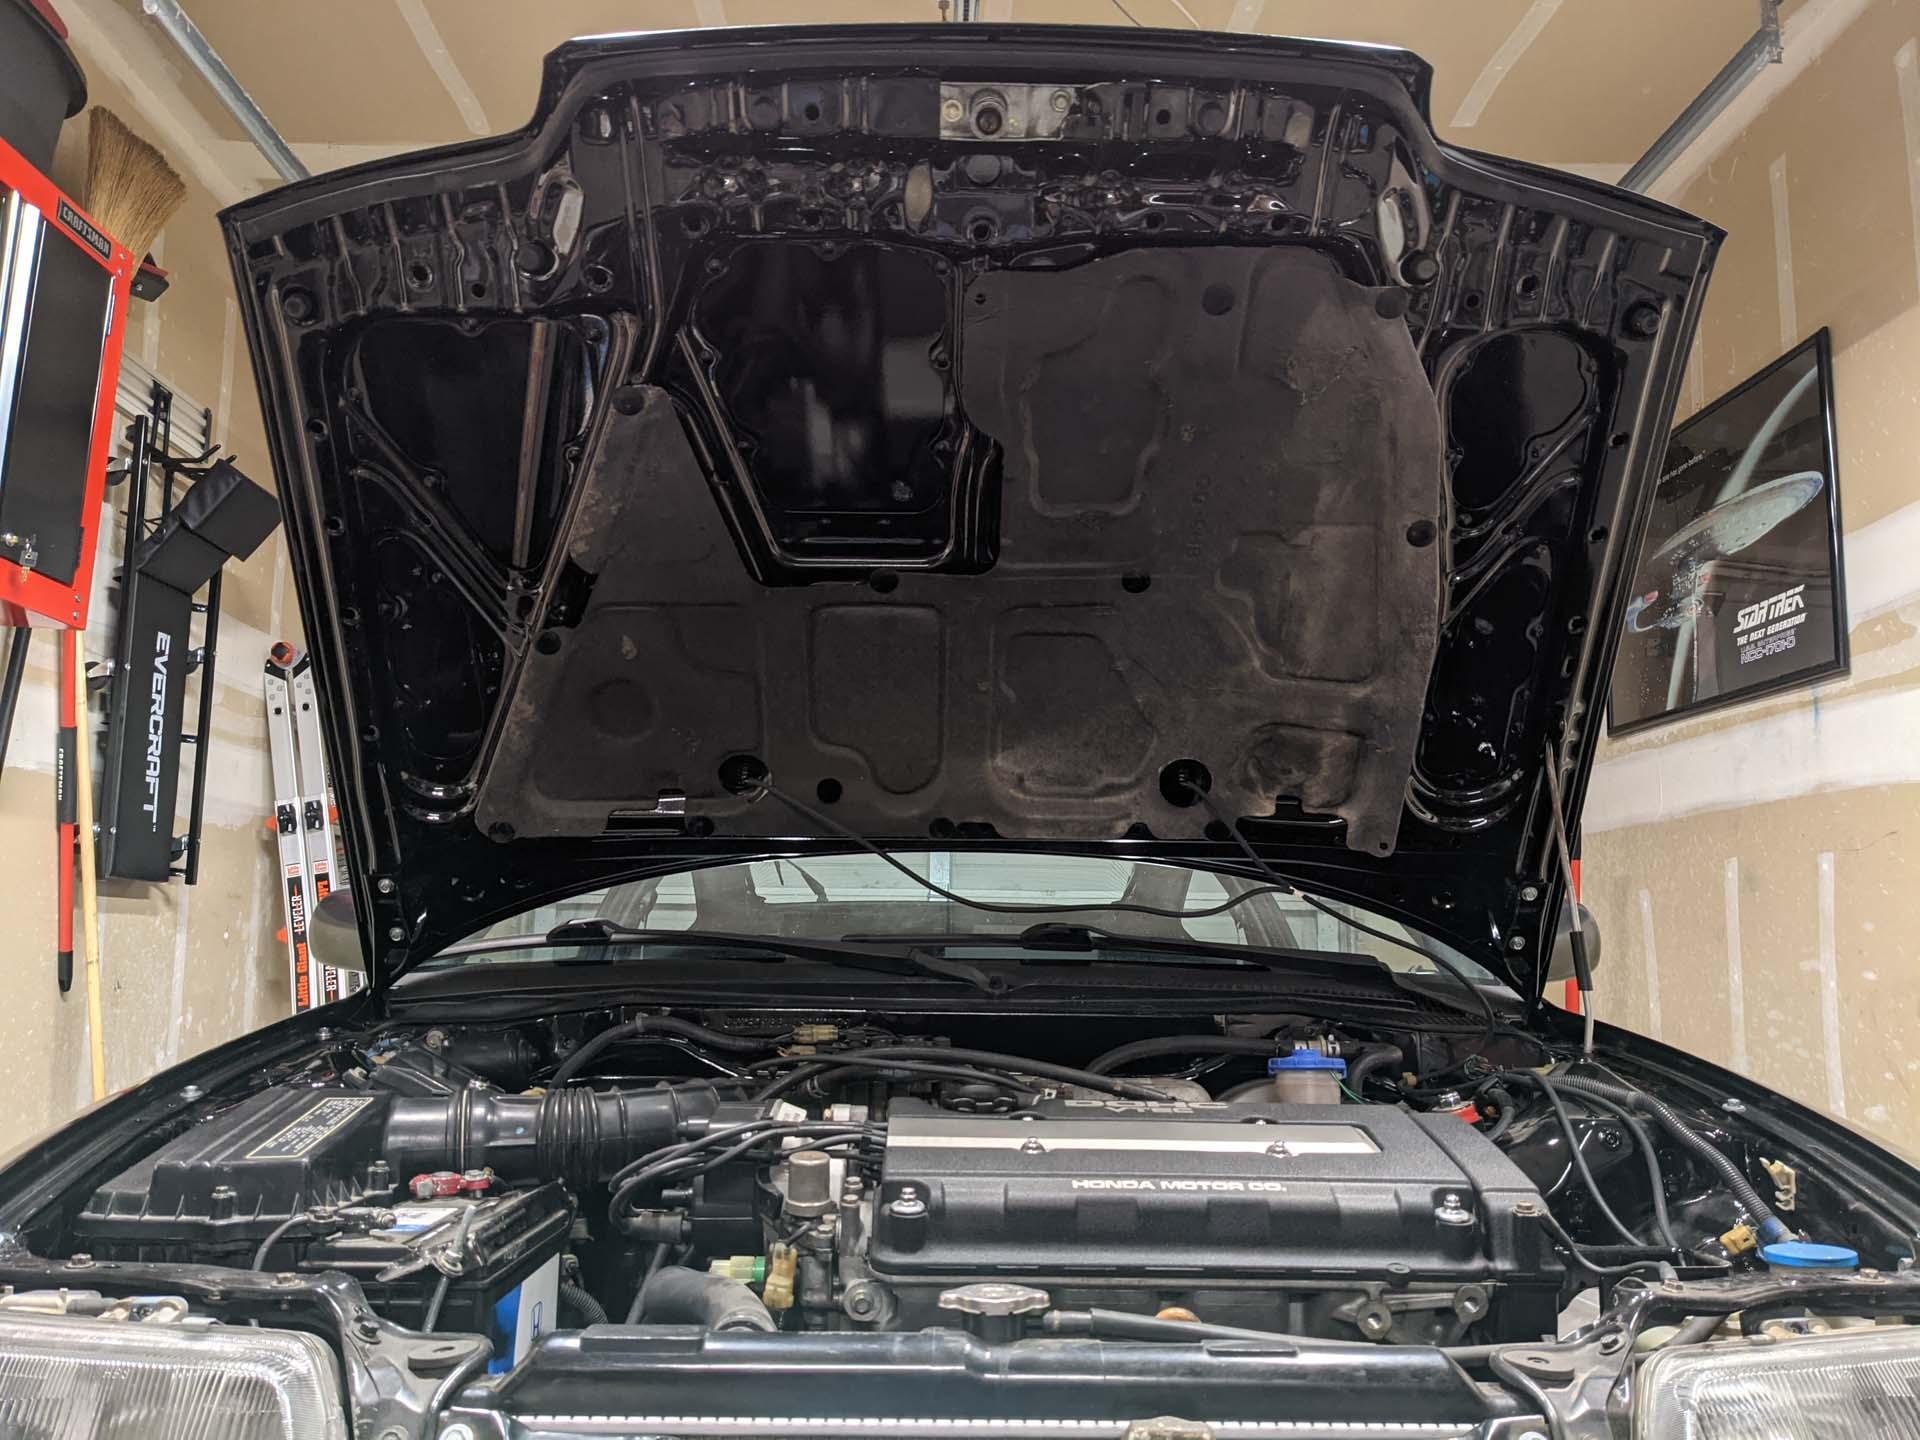 Replacement hood insulator